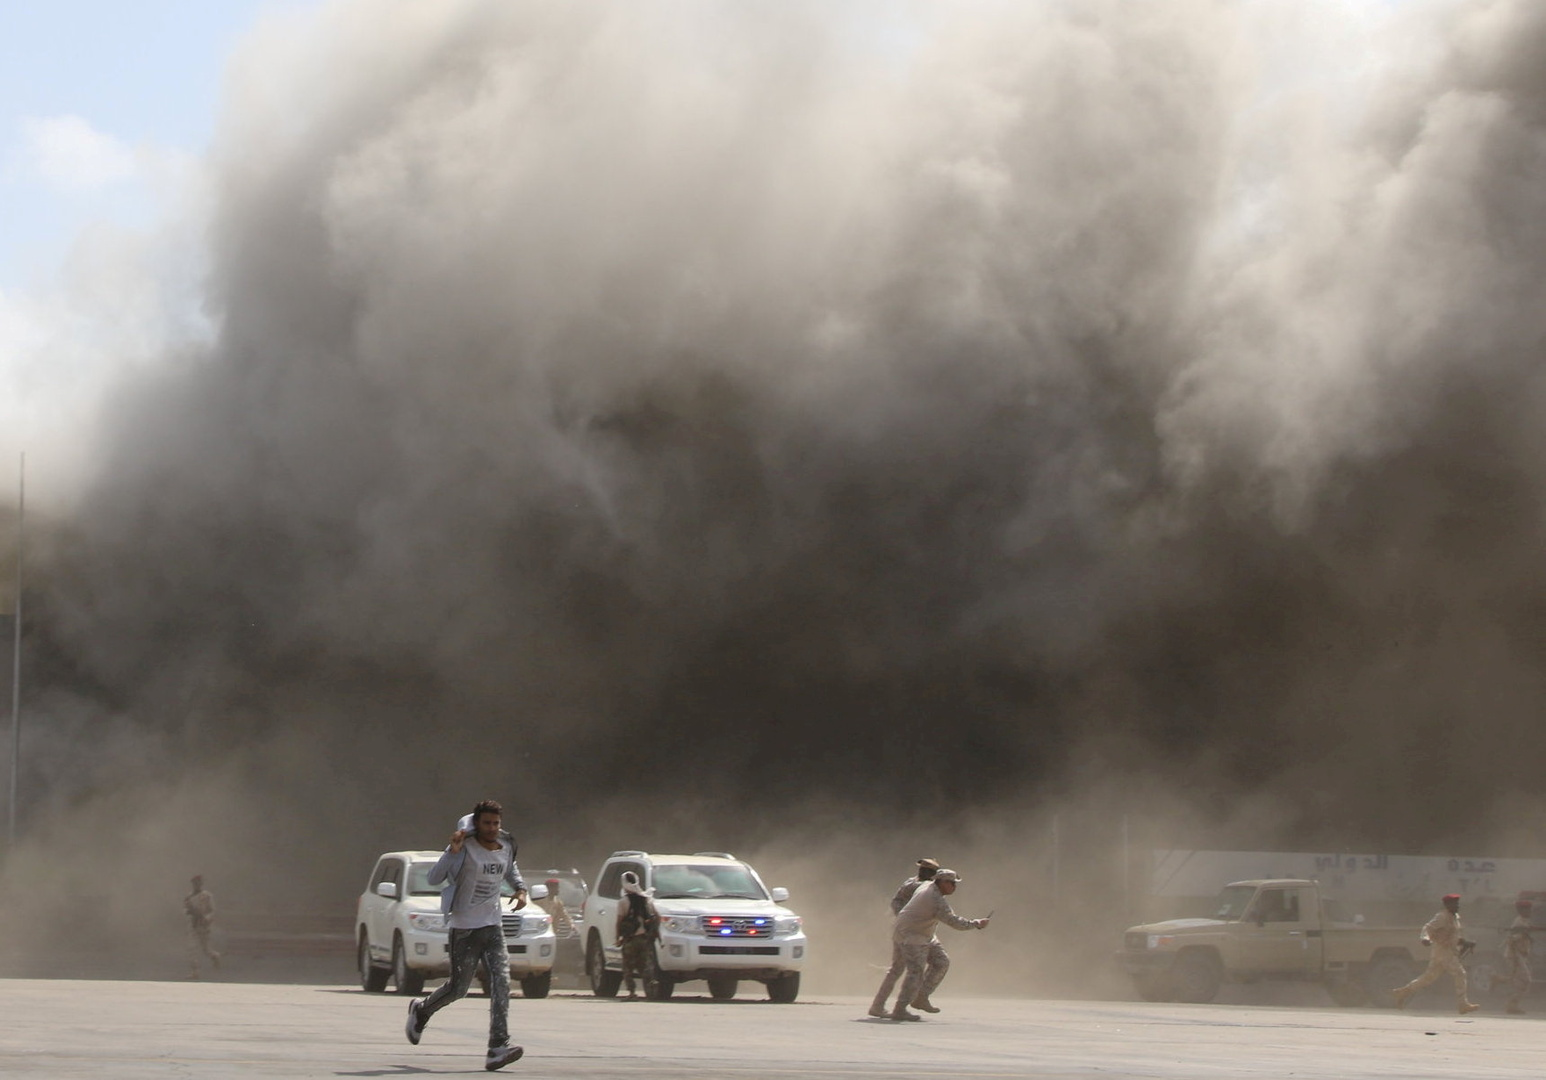 سماع دوي انفجار ضخم في عدن